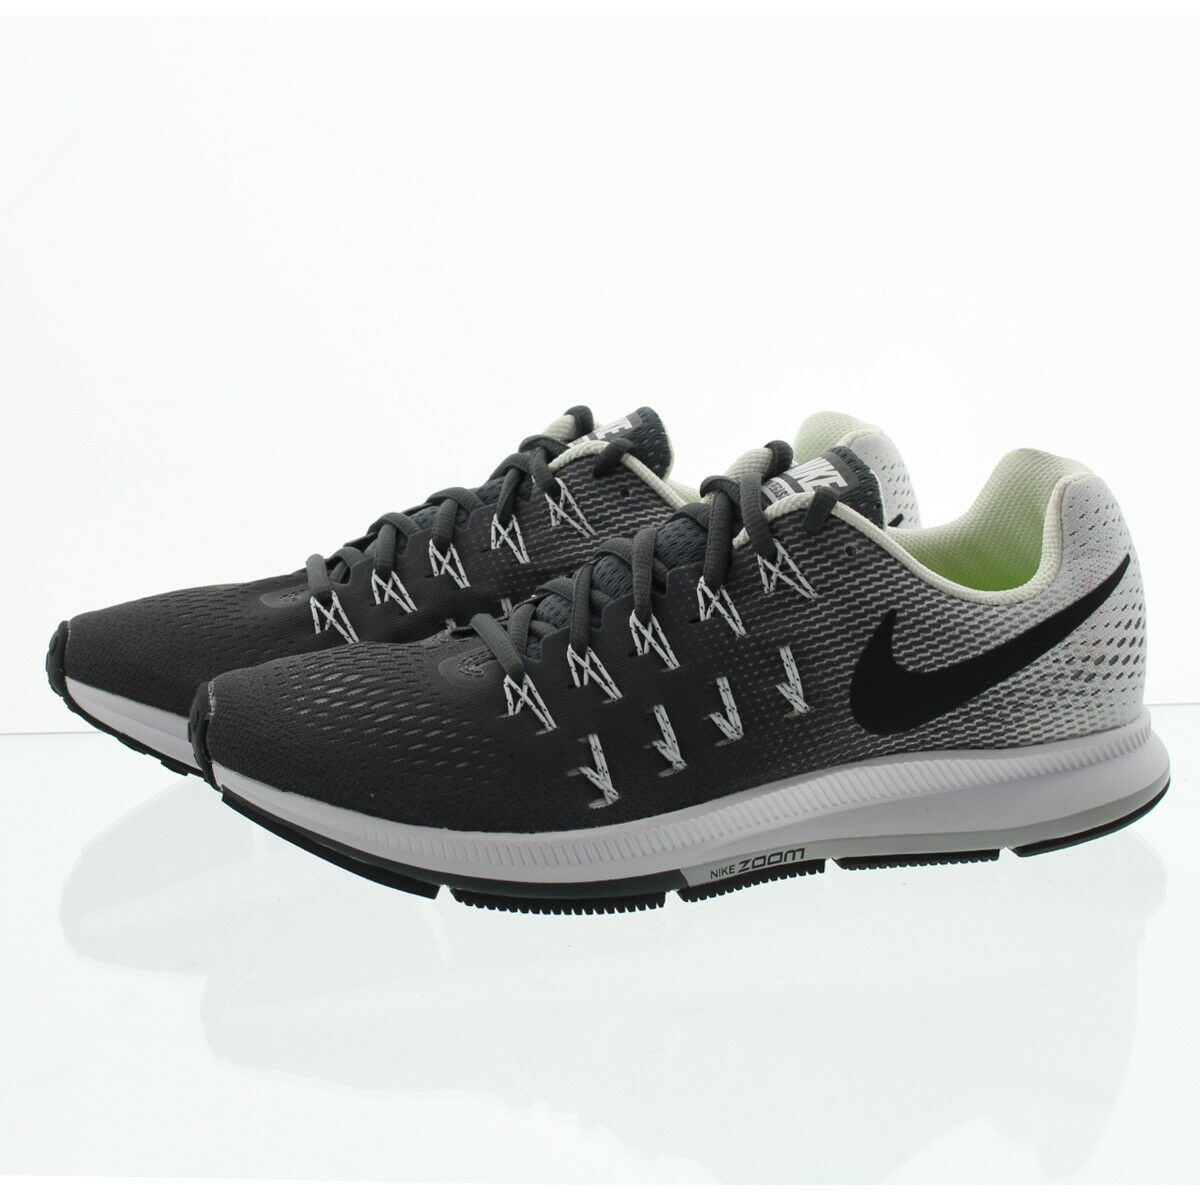 Nike Air Zoom Pegasus 33 Mens Running Shoes 9.5 Dark Grey White ... e6470ba6f